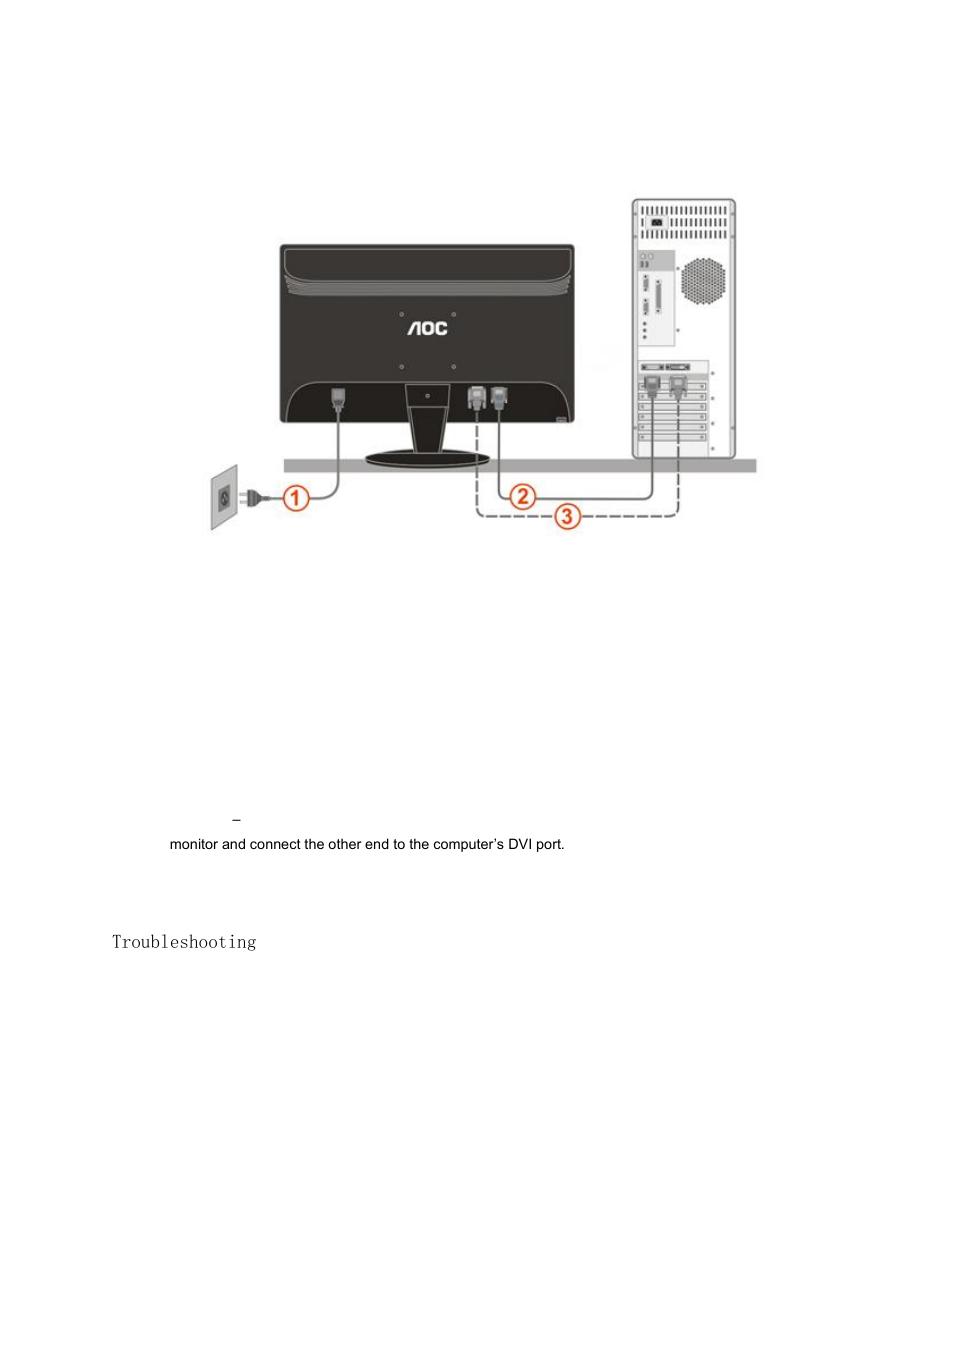 aoc 2436vw manual manual guide example 2018 u2022 rh bagelpantry com User Training User Guide Template